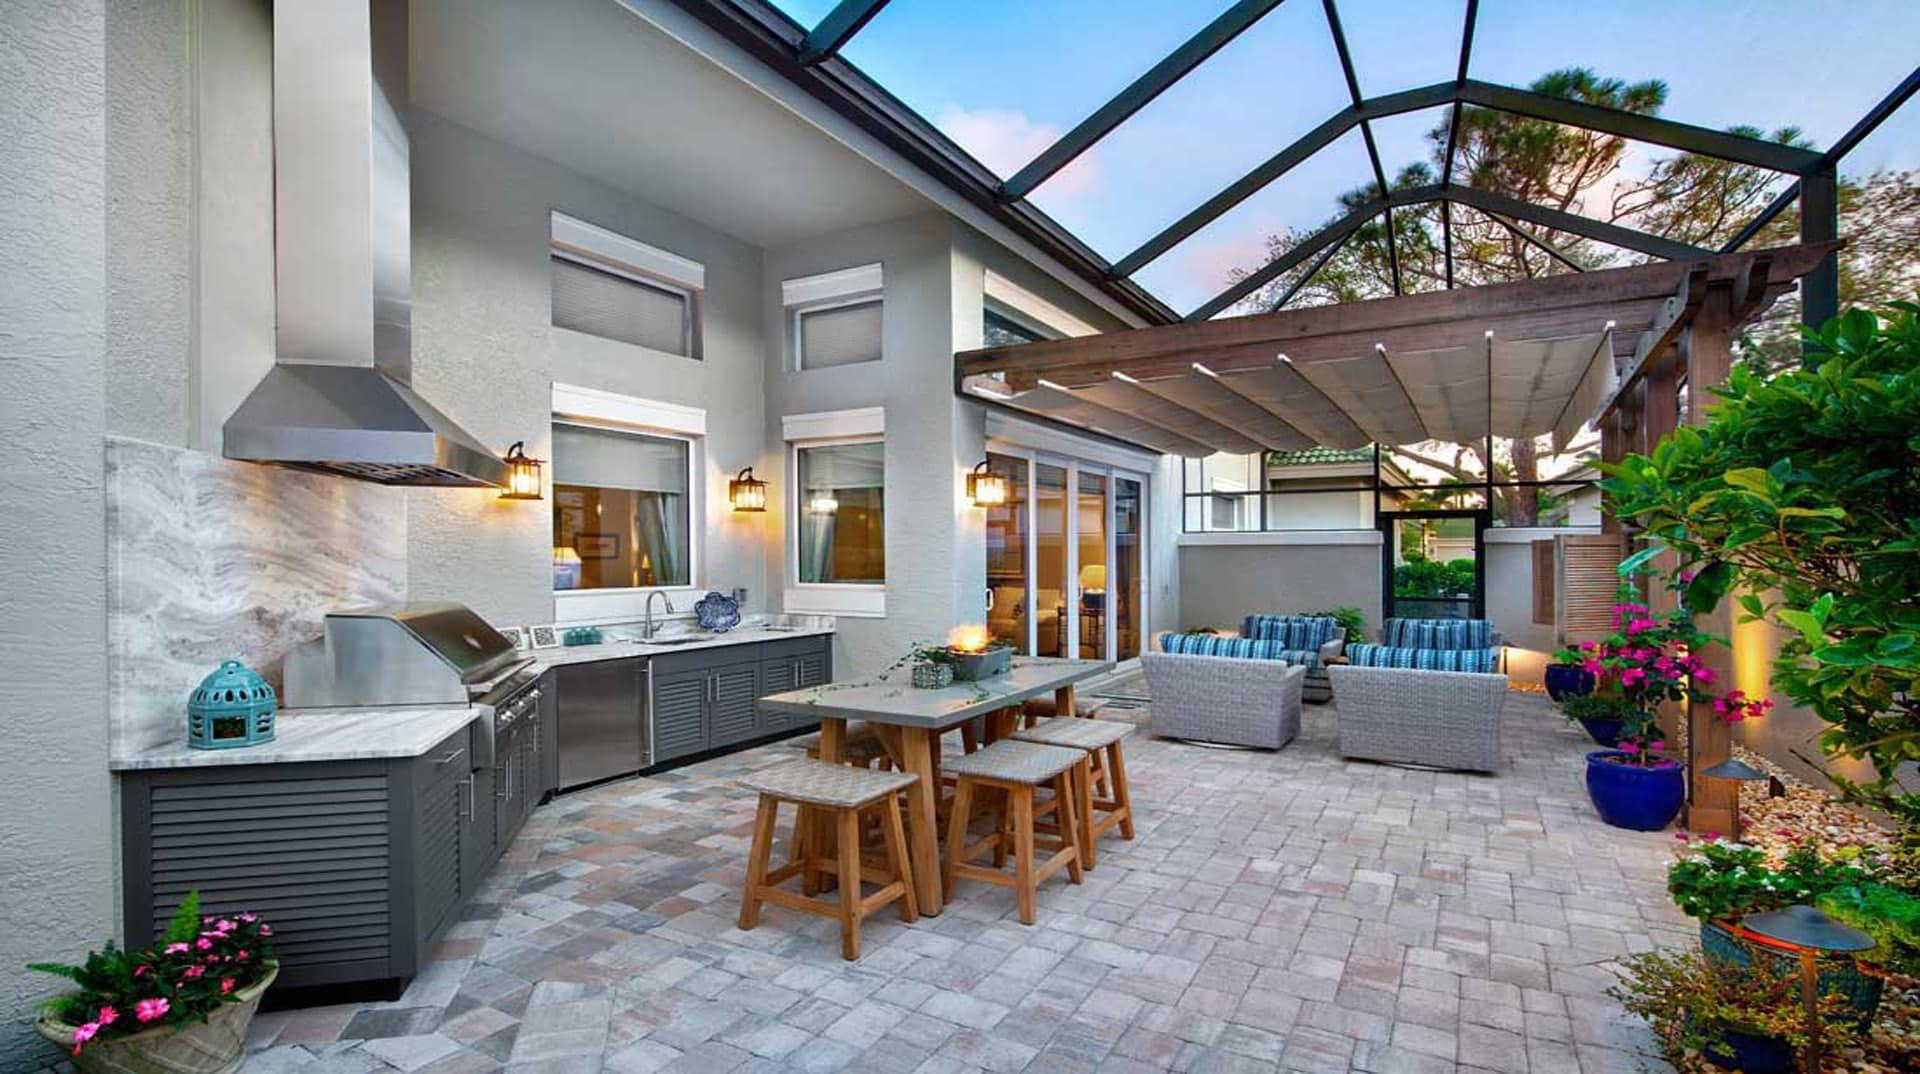 florida keys second home mortgage, florida keys second mortgage, florida keys second home loan, florida keys 2nd home mortgage